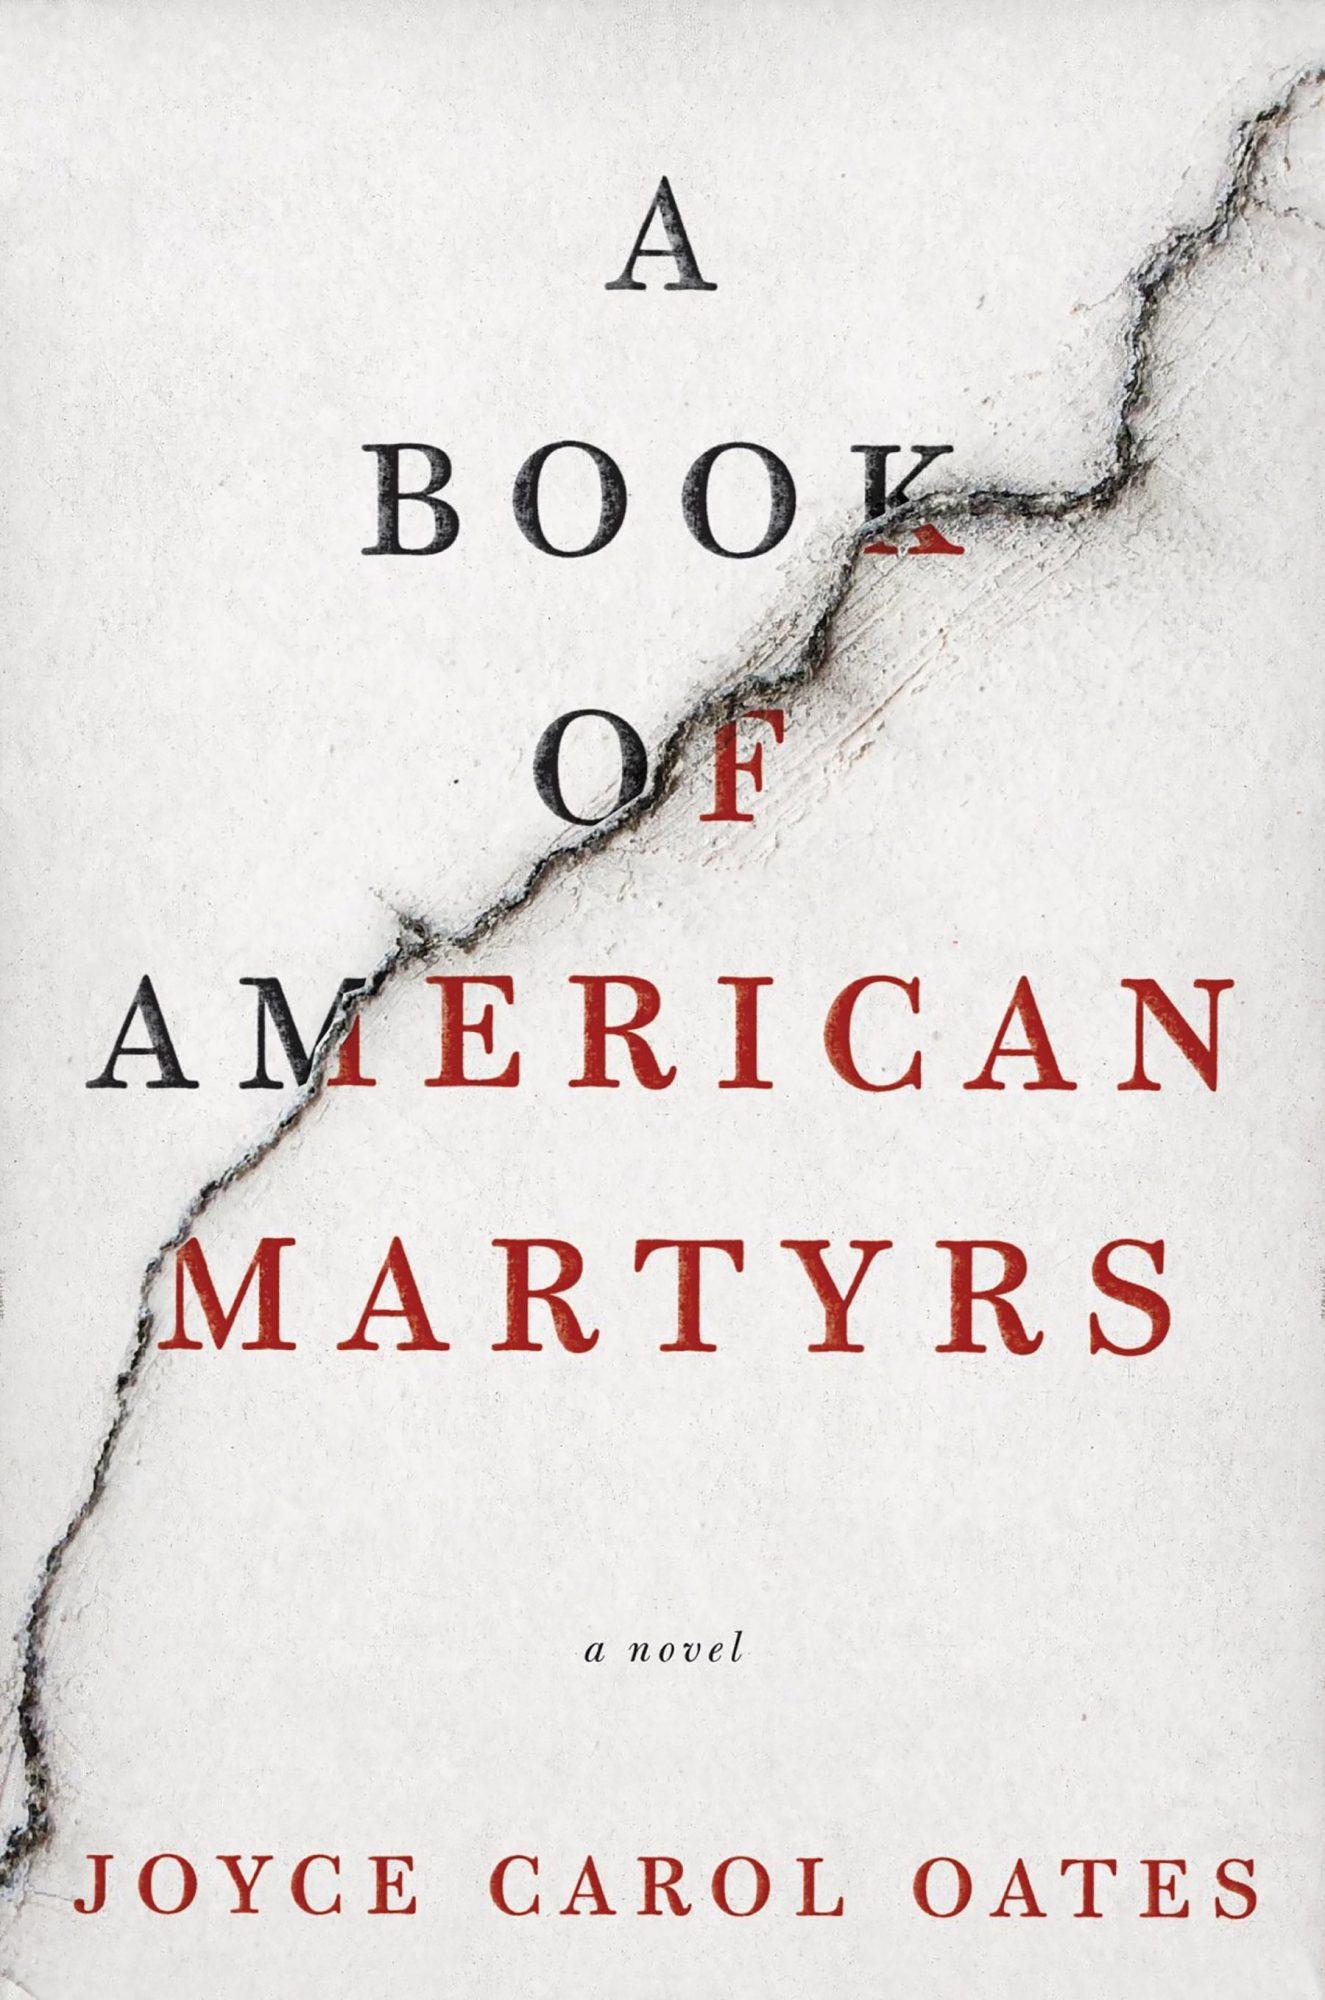 A Book of American Martyrs by Joyce Carol Oates CR: HarperCollins